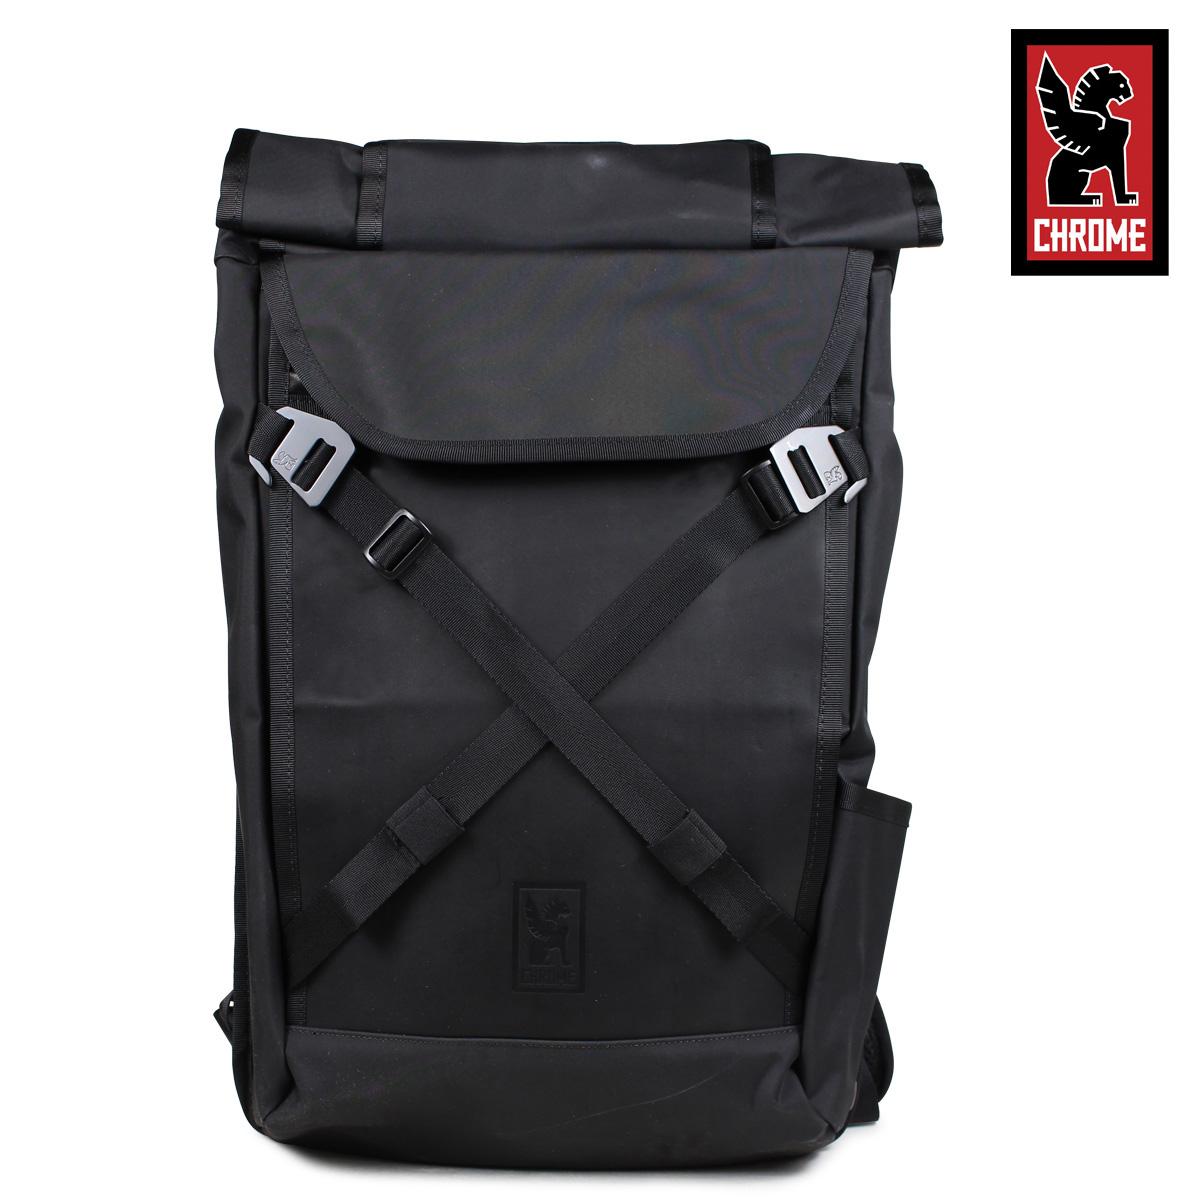 CHROME リュック バッグ クローム バックパック 25L メンズ レディース BRAVO 2.0 ブラック BG-190